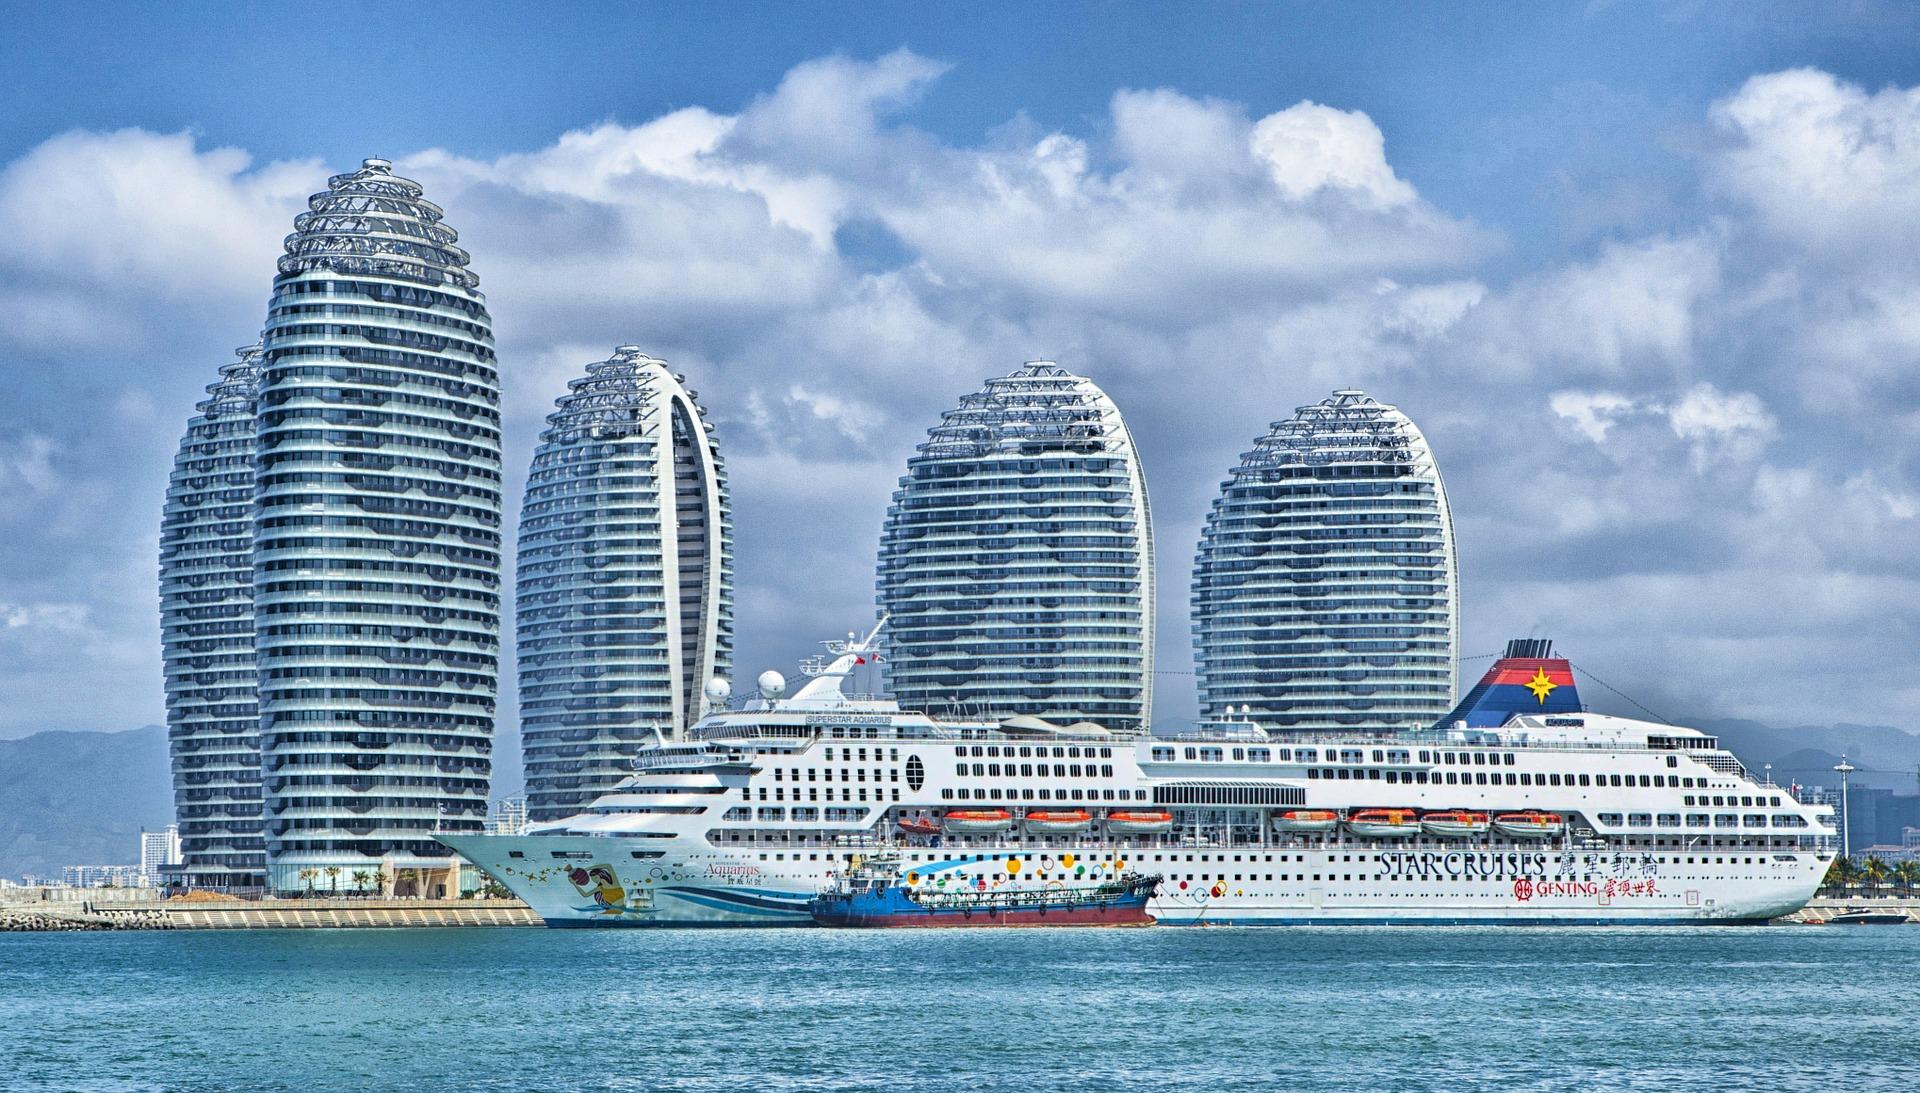 HAINAN: CHINA'S ISLAND-PROVINCE FREE TRADE PORT